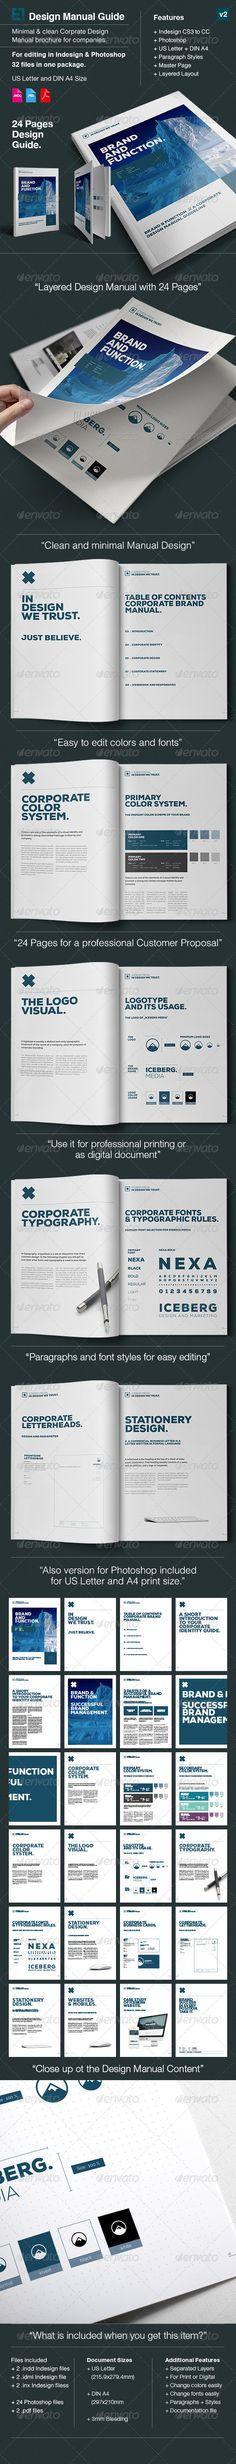 Elite Corporate Design Manual Guide 24